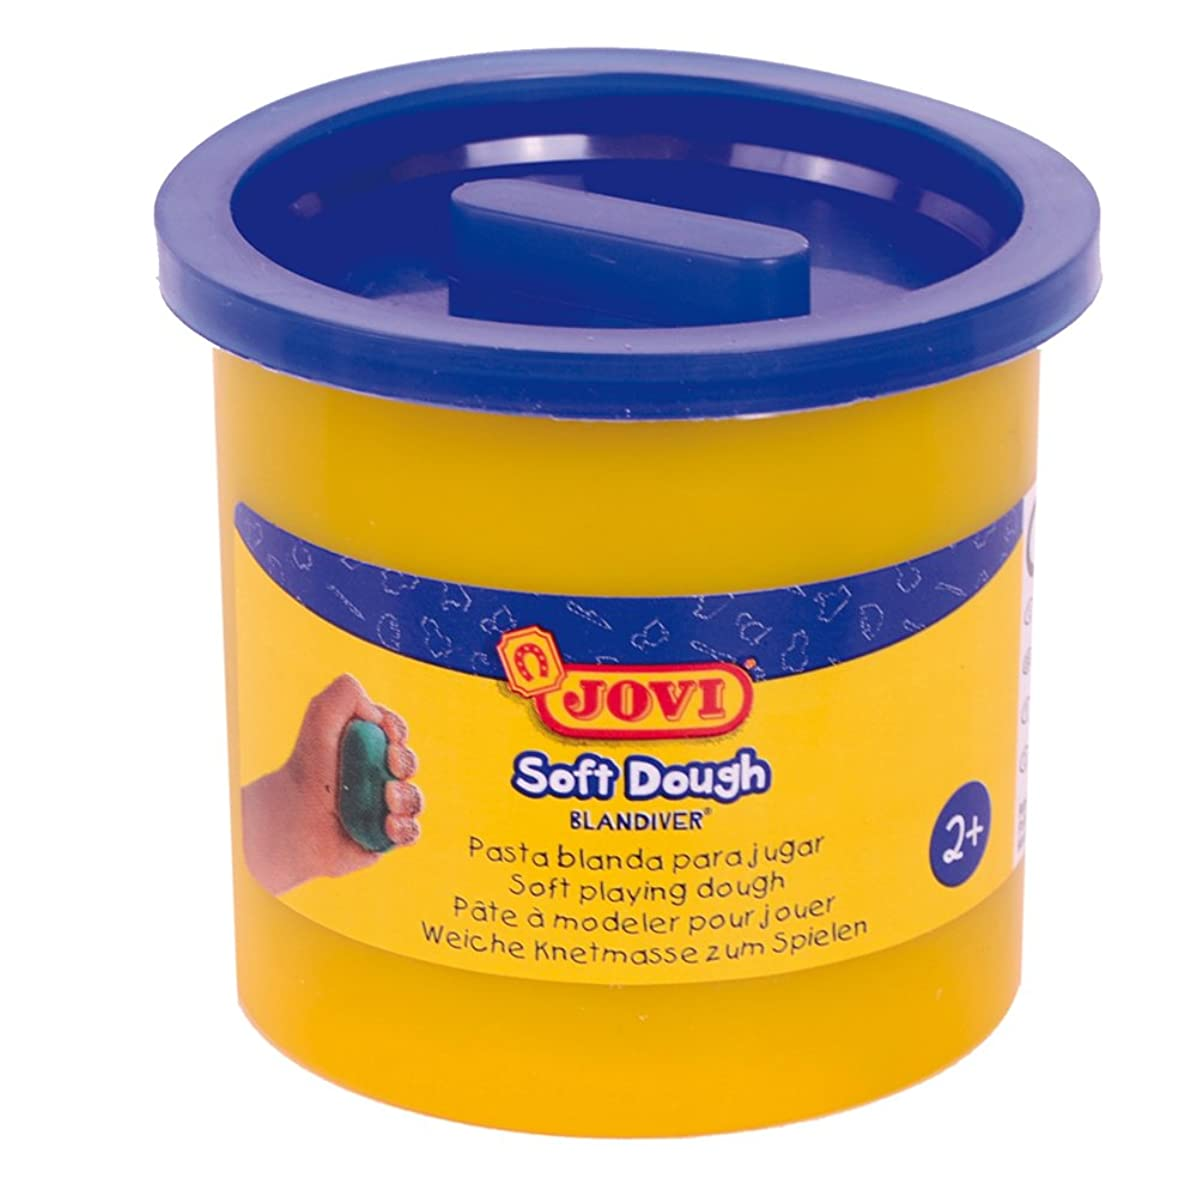 Jovi?–?Soft Dough blandiver, Case of 5?Jars, 110?g, Blue (45005)